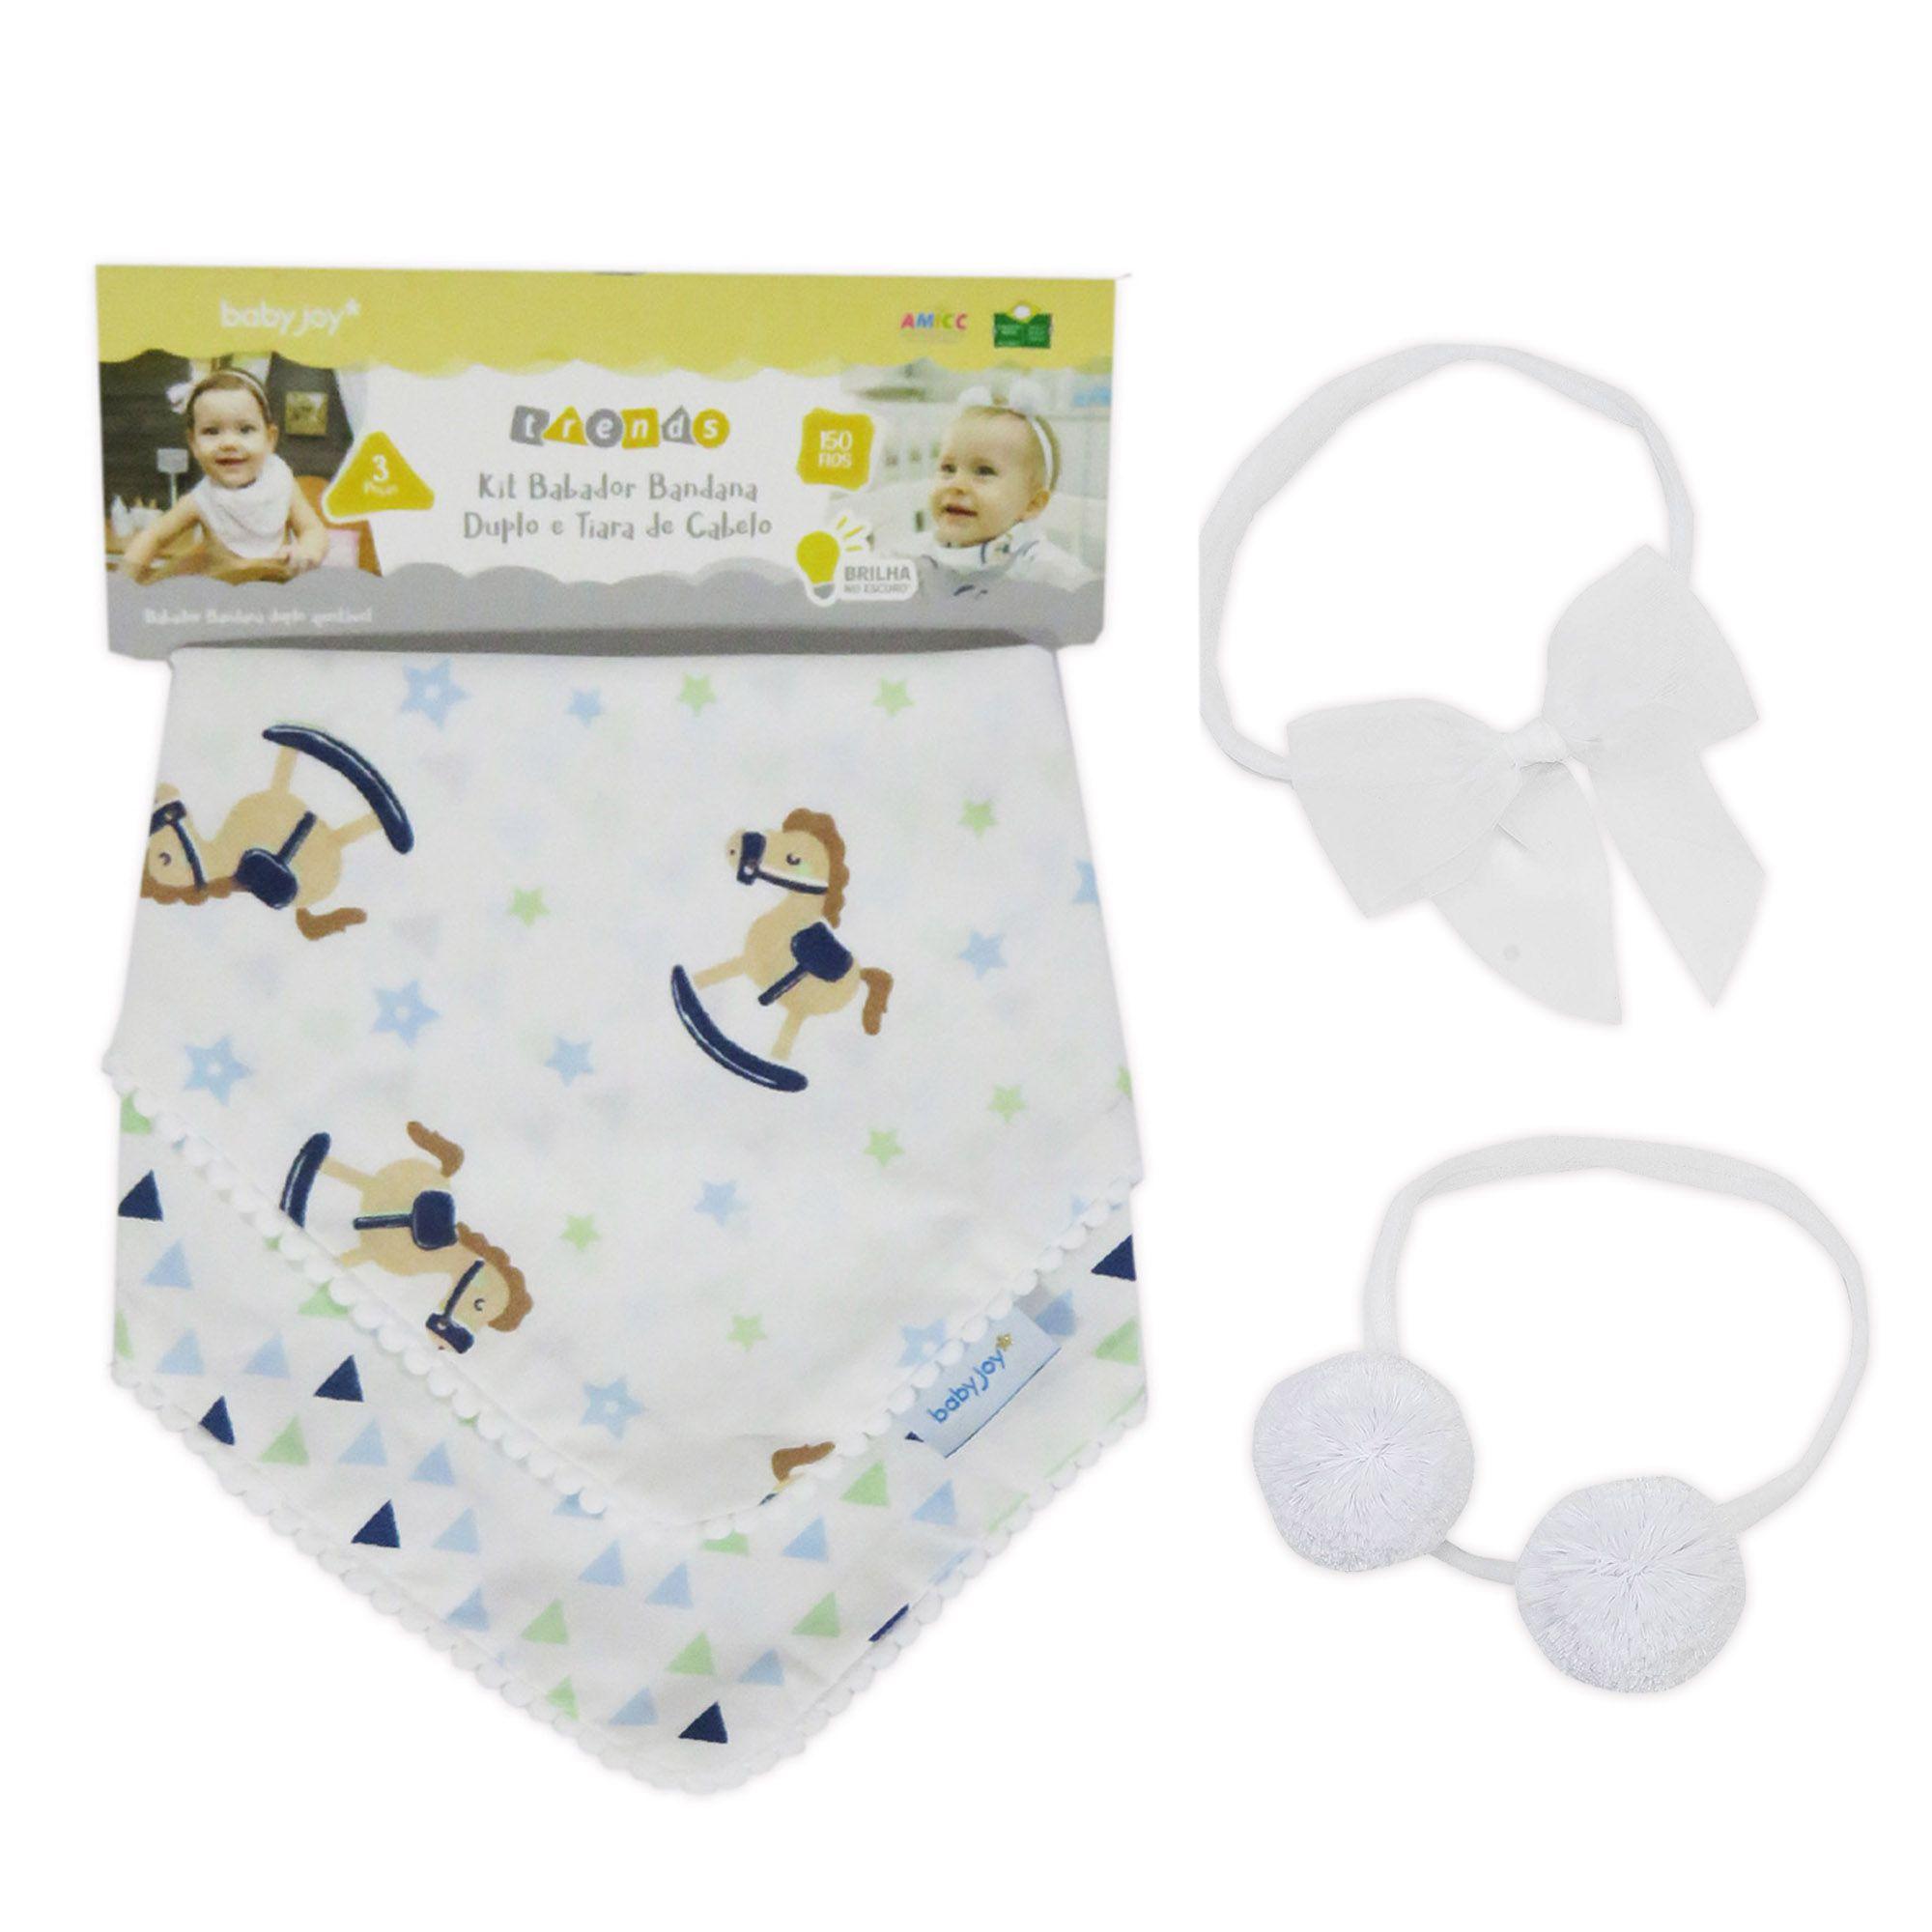 Kit Babador Bandana Incomfral Babyjoy - Branco